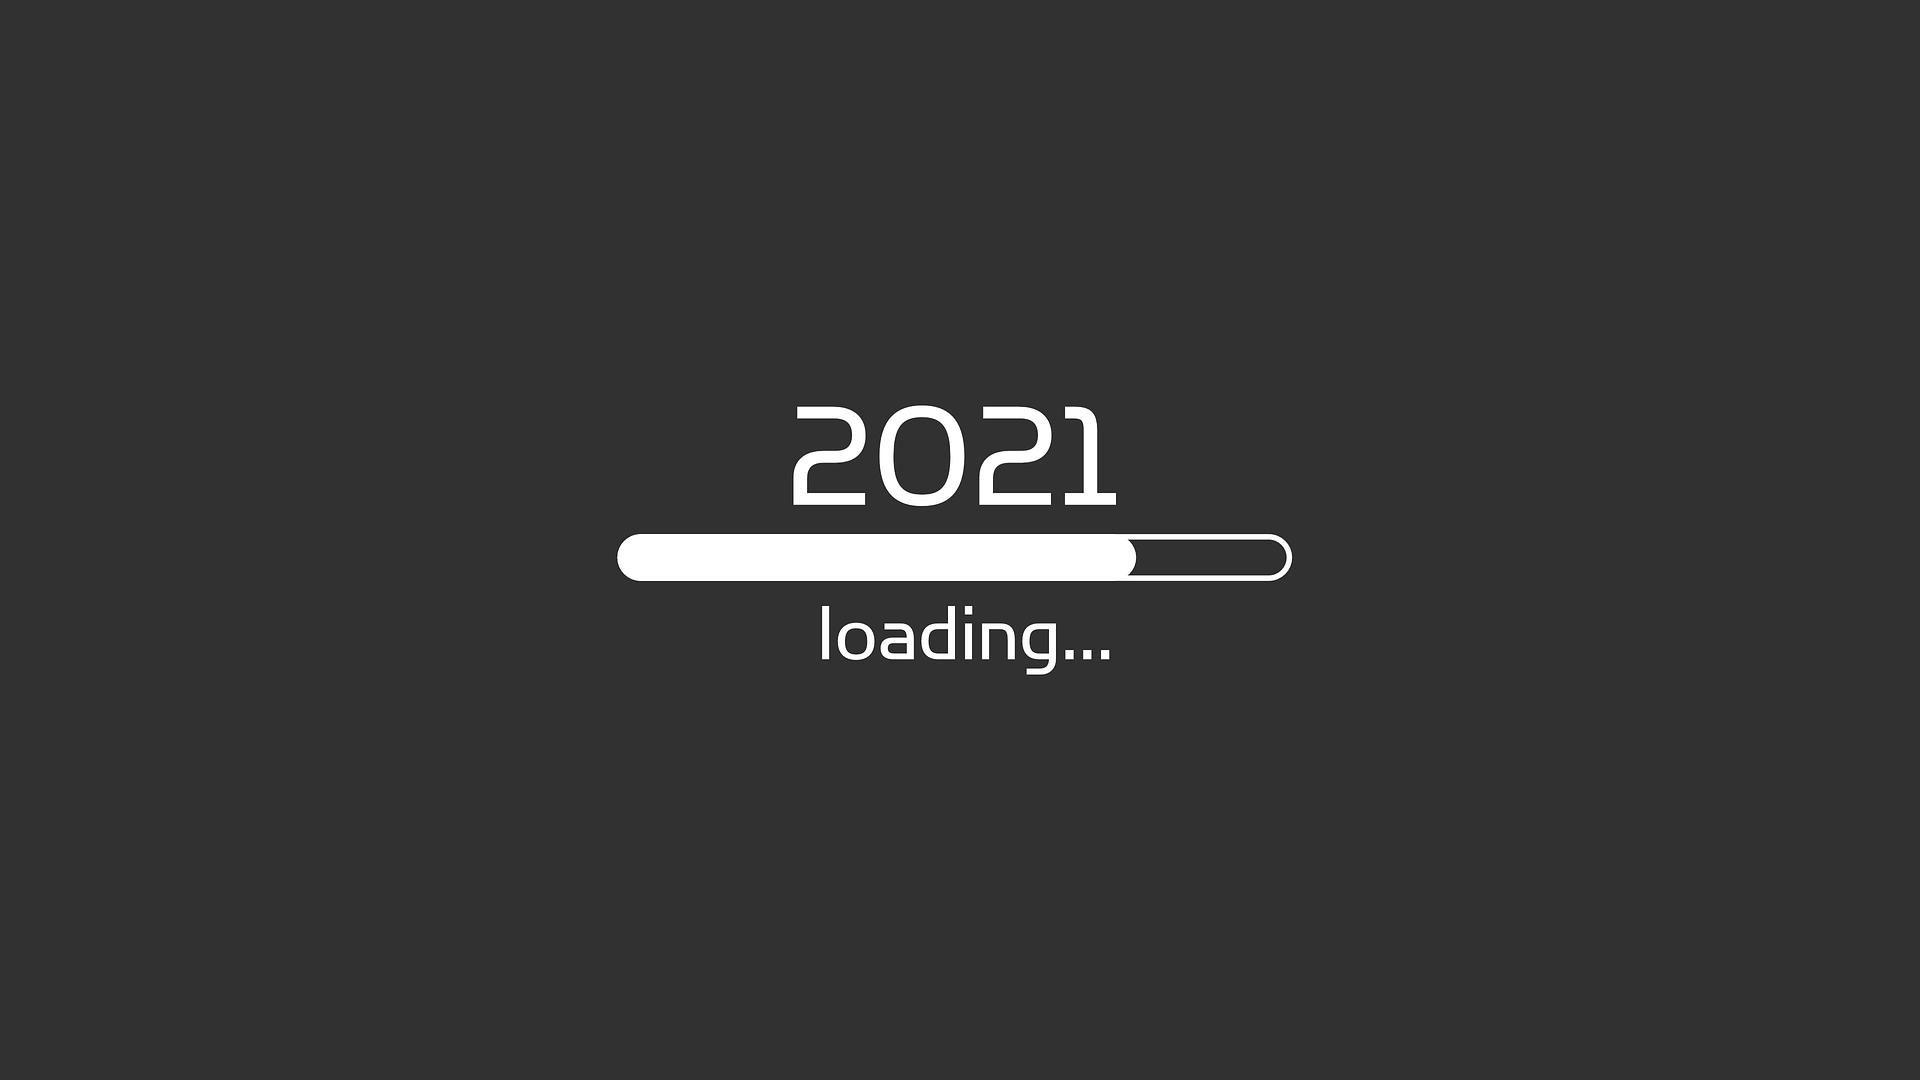 loading-bar-5522019_1920